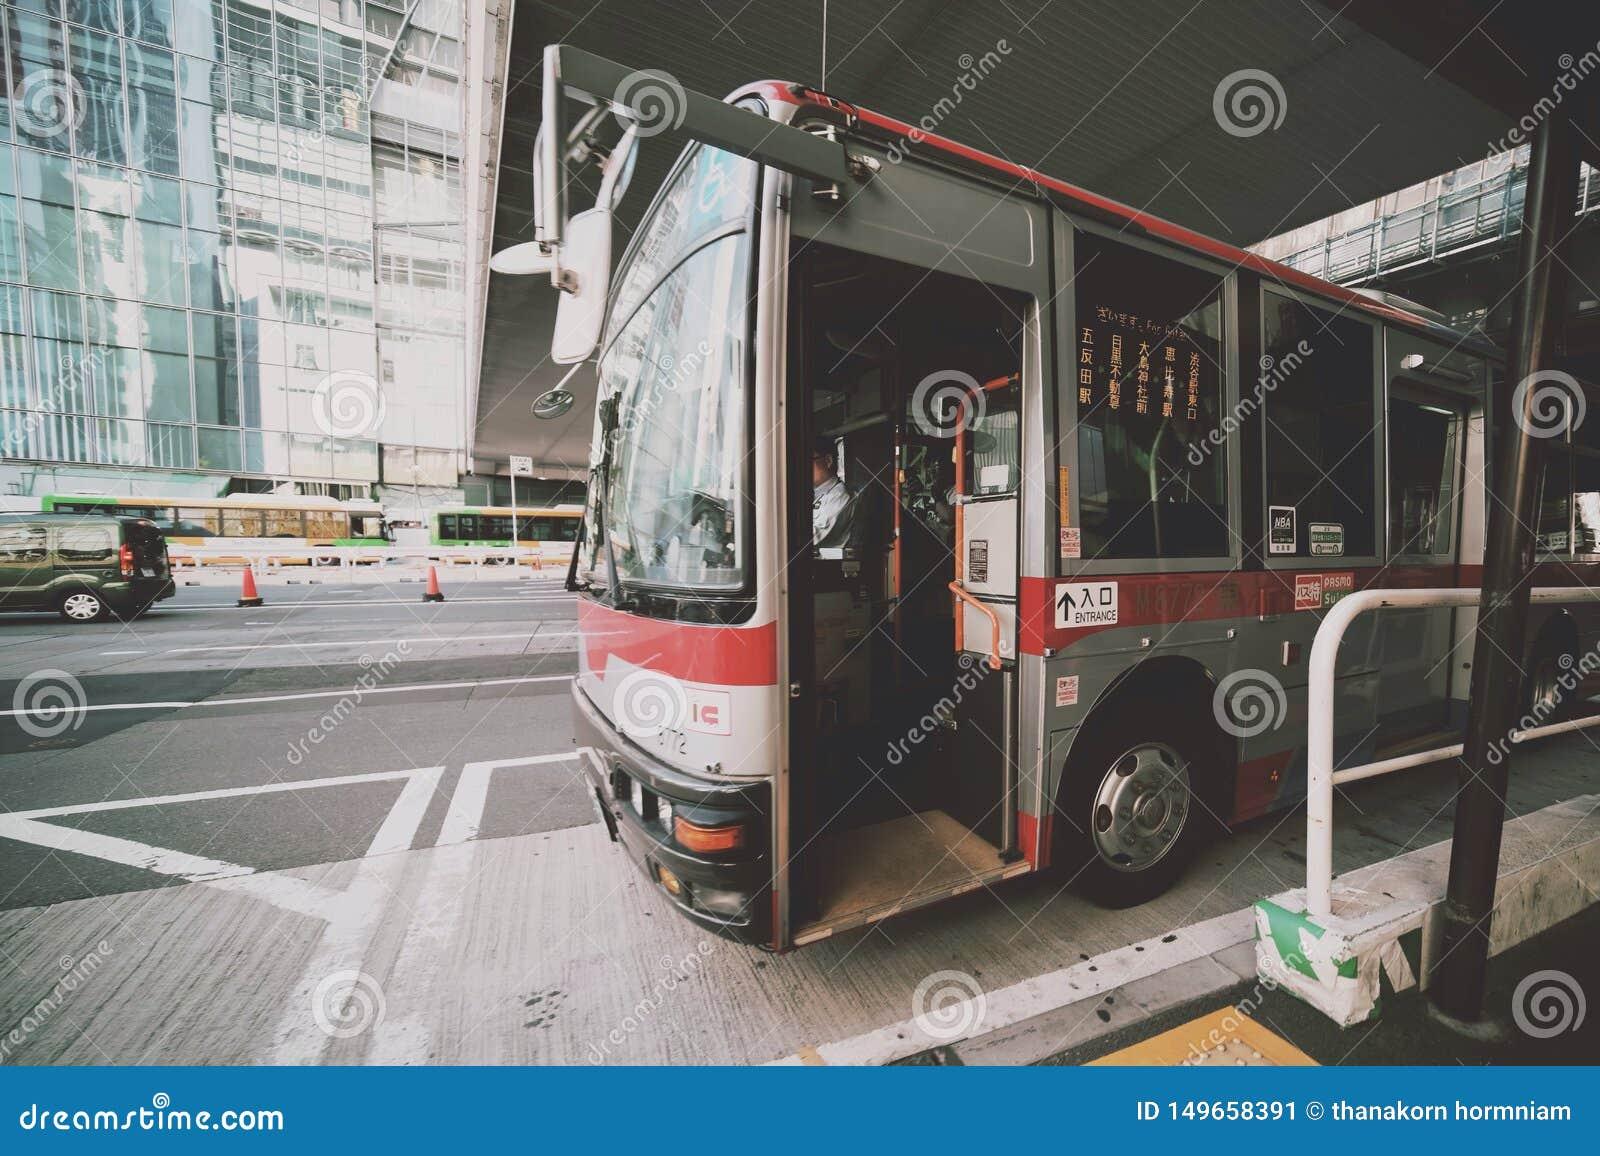 Bus in Tokyo